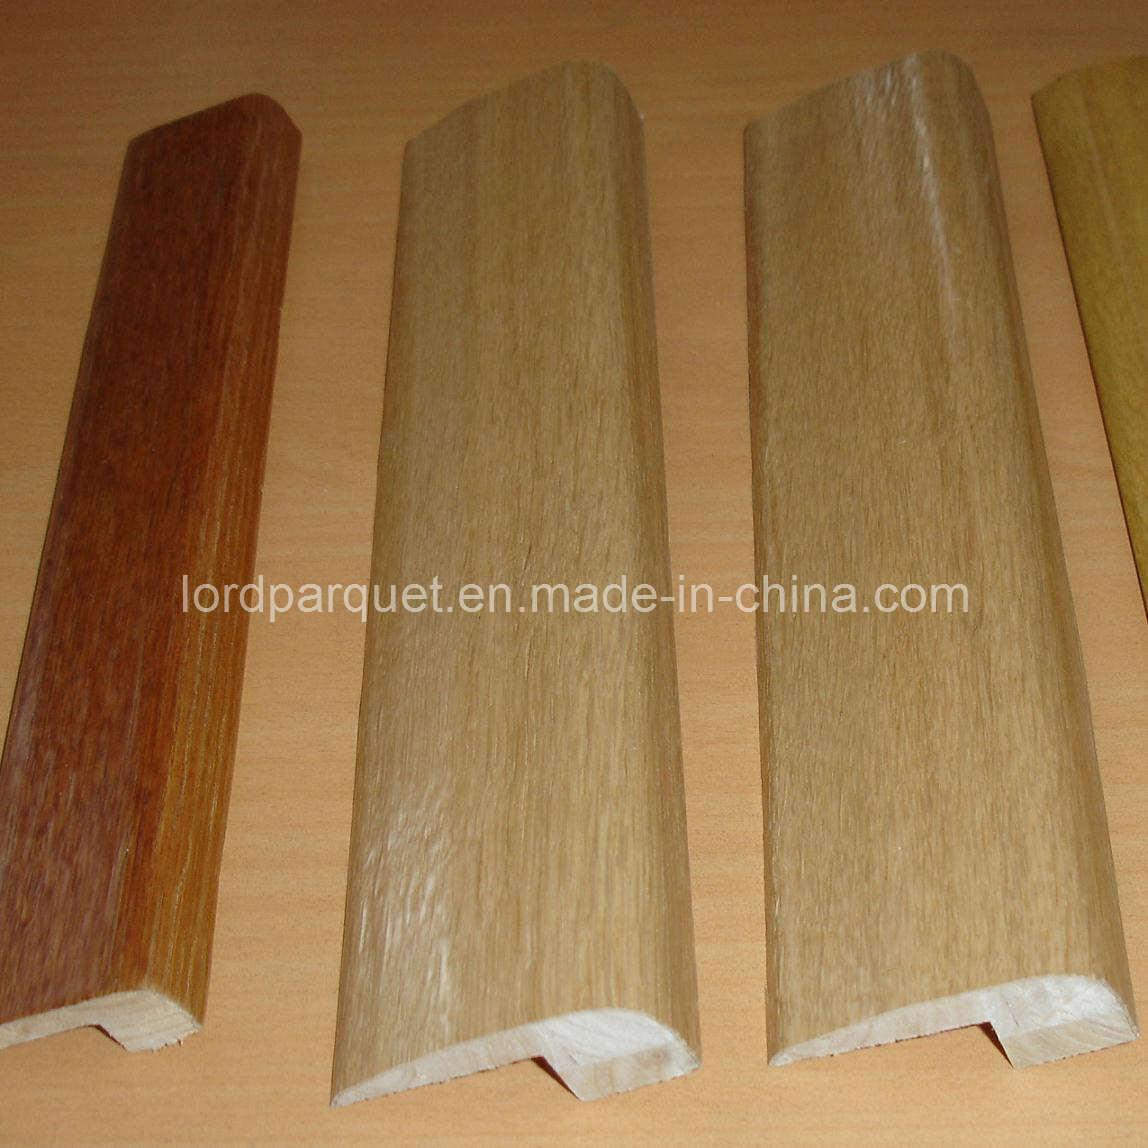 China Wood Floor Molding Ldp M04 China Wood Floor